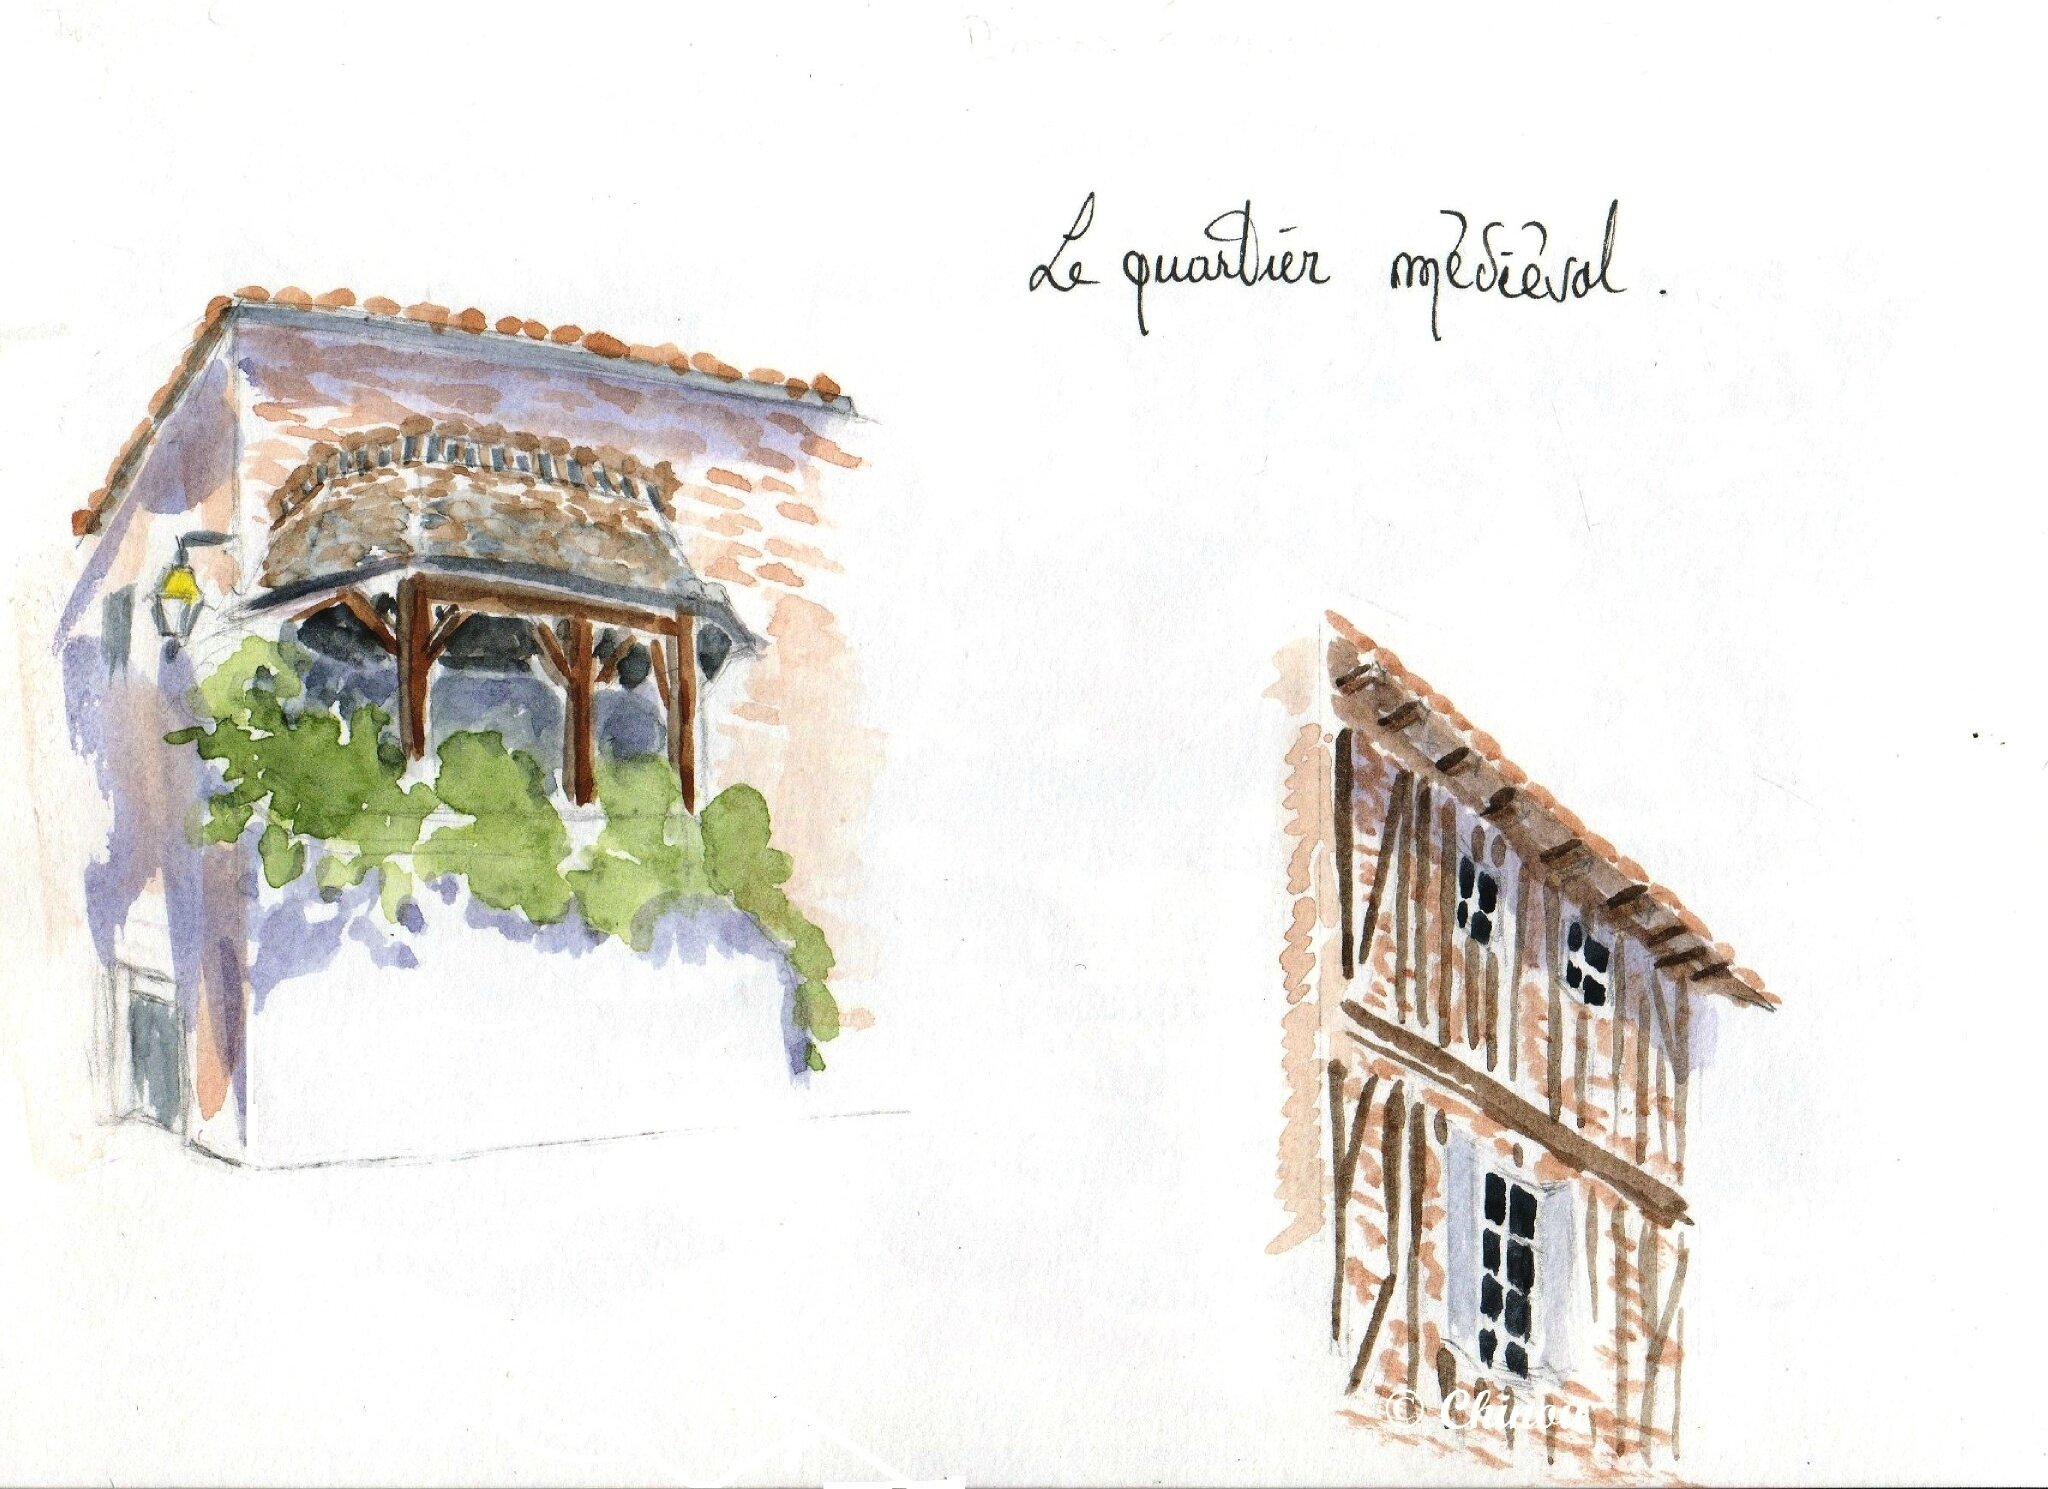 Marmande Quartier Médiéval